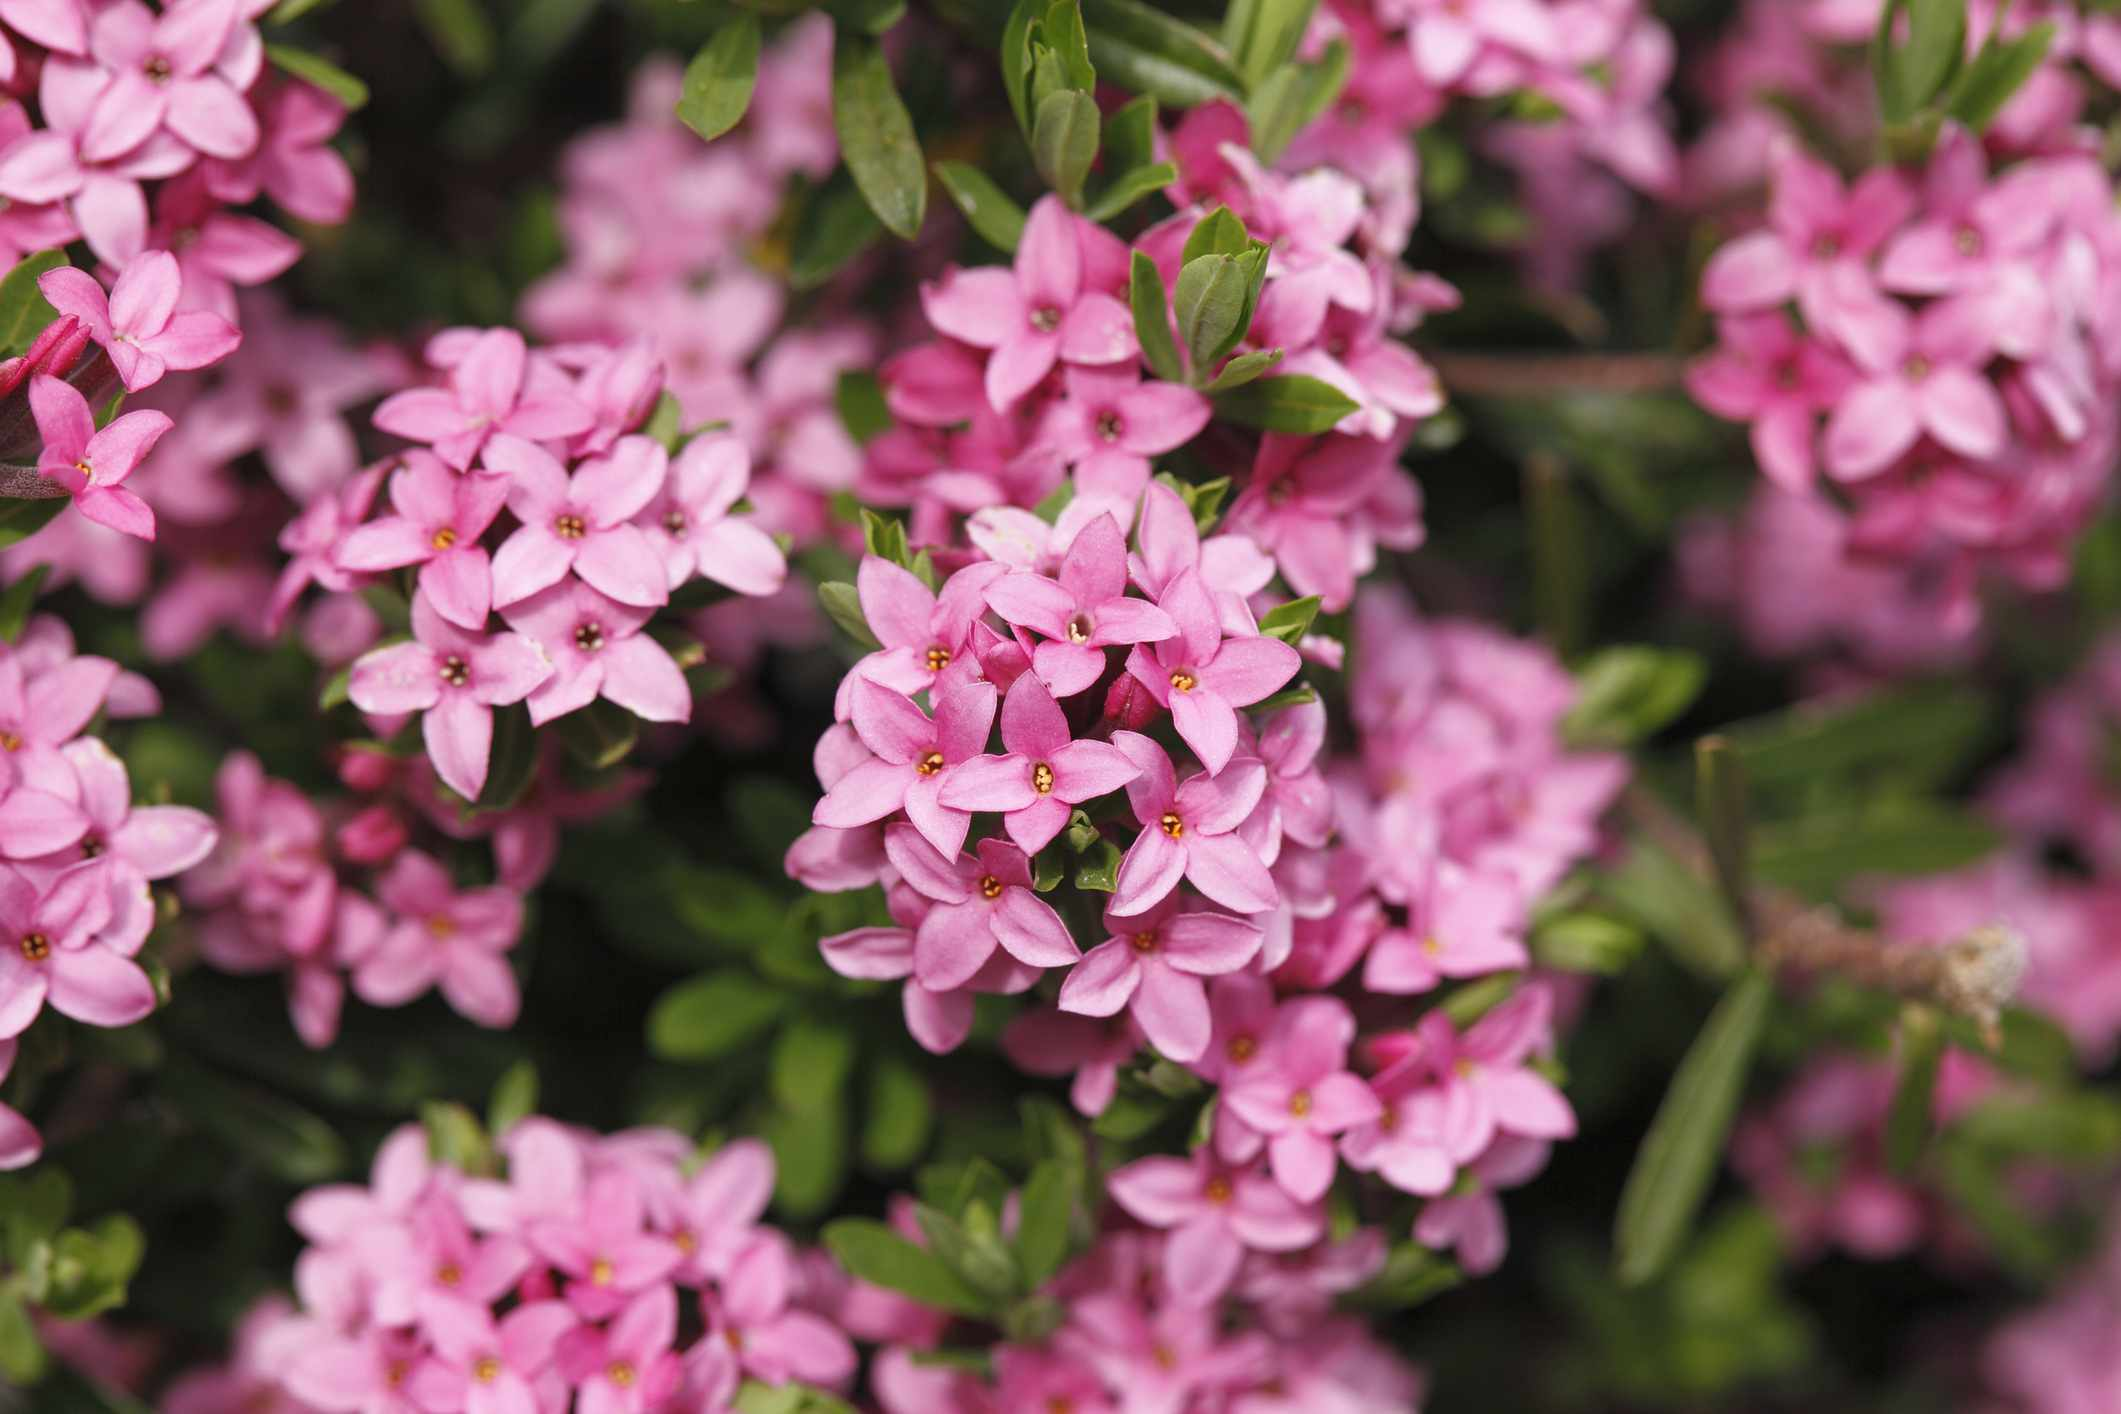 Pink Daphne flowers